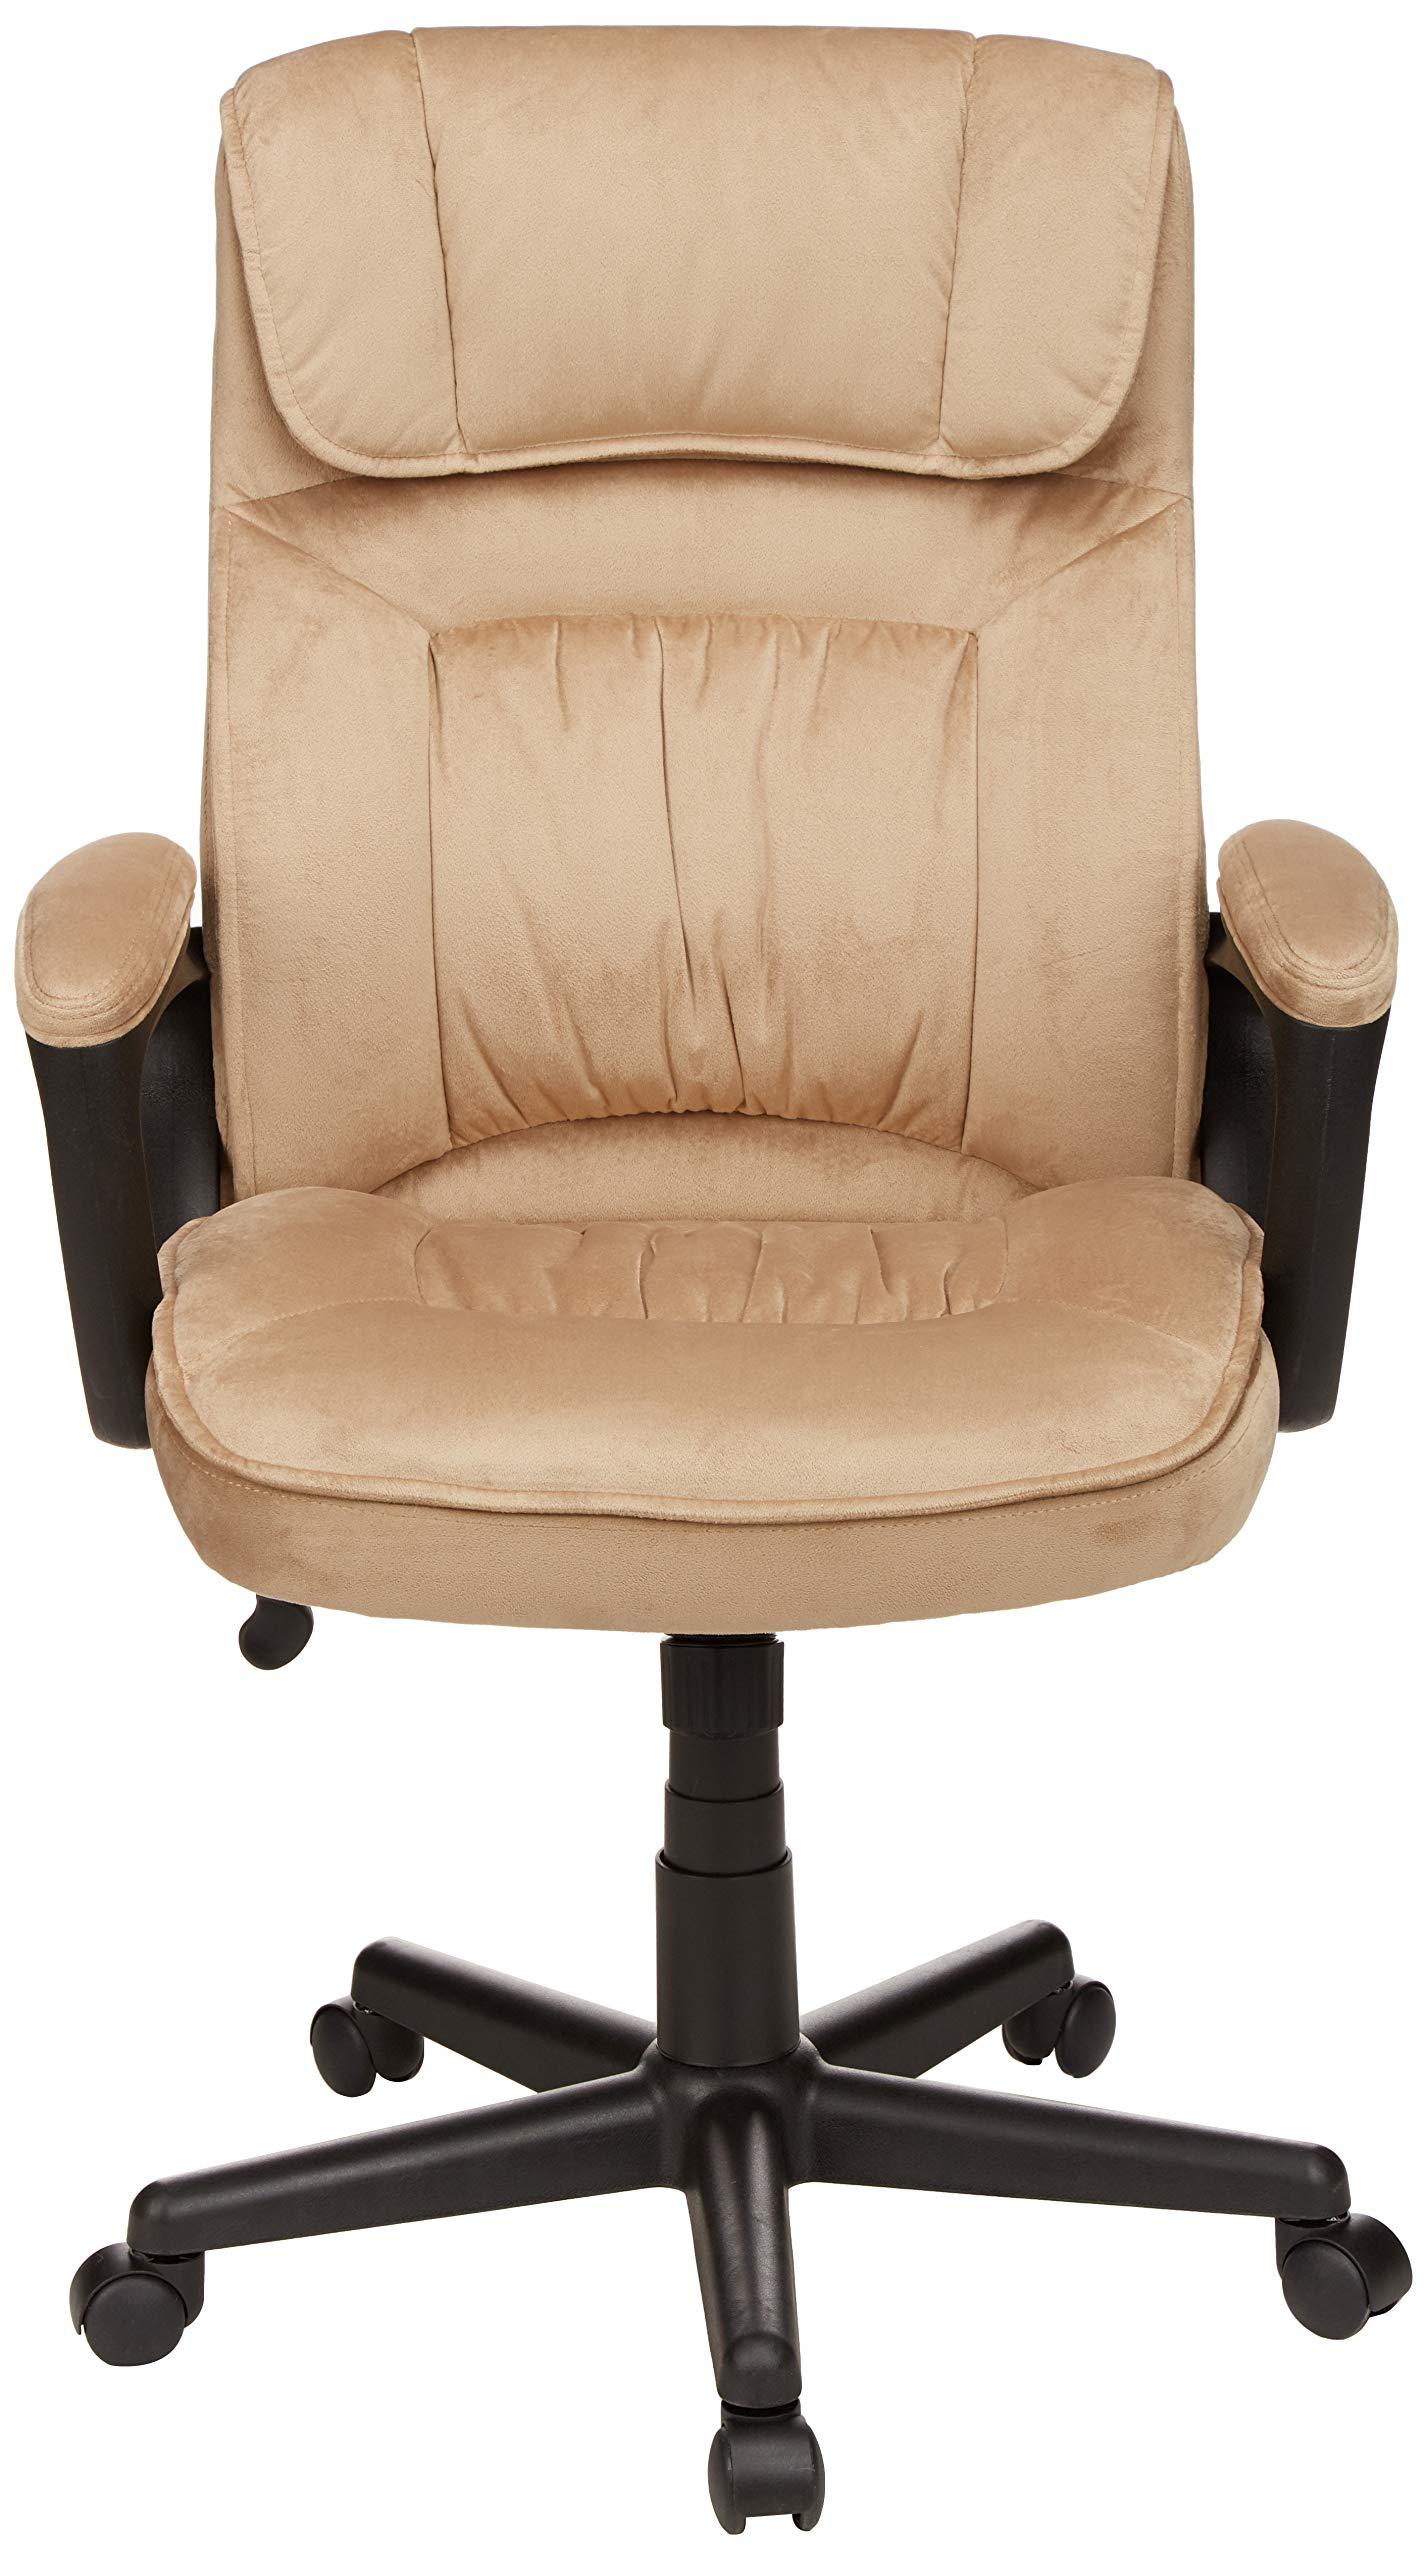 AmazonBasics Classic Office Chair - Adjustable, Swiveling, Microfiber Cover - Light Beige by AmazonBasics (Image #4)